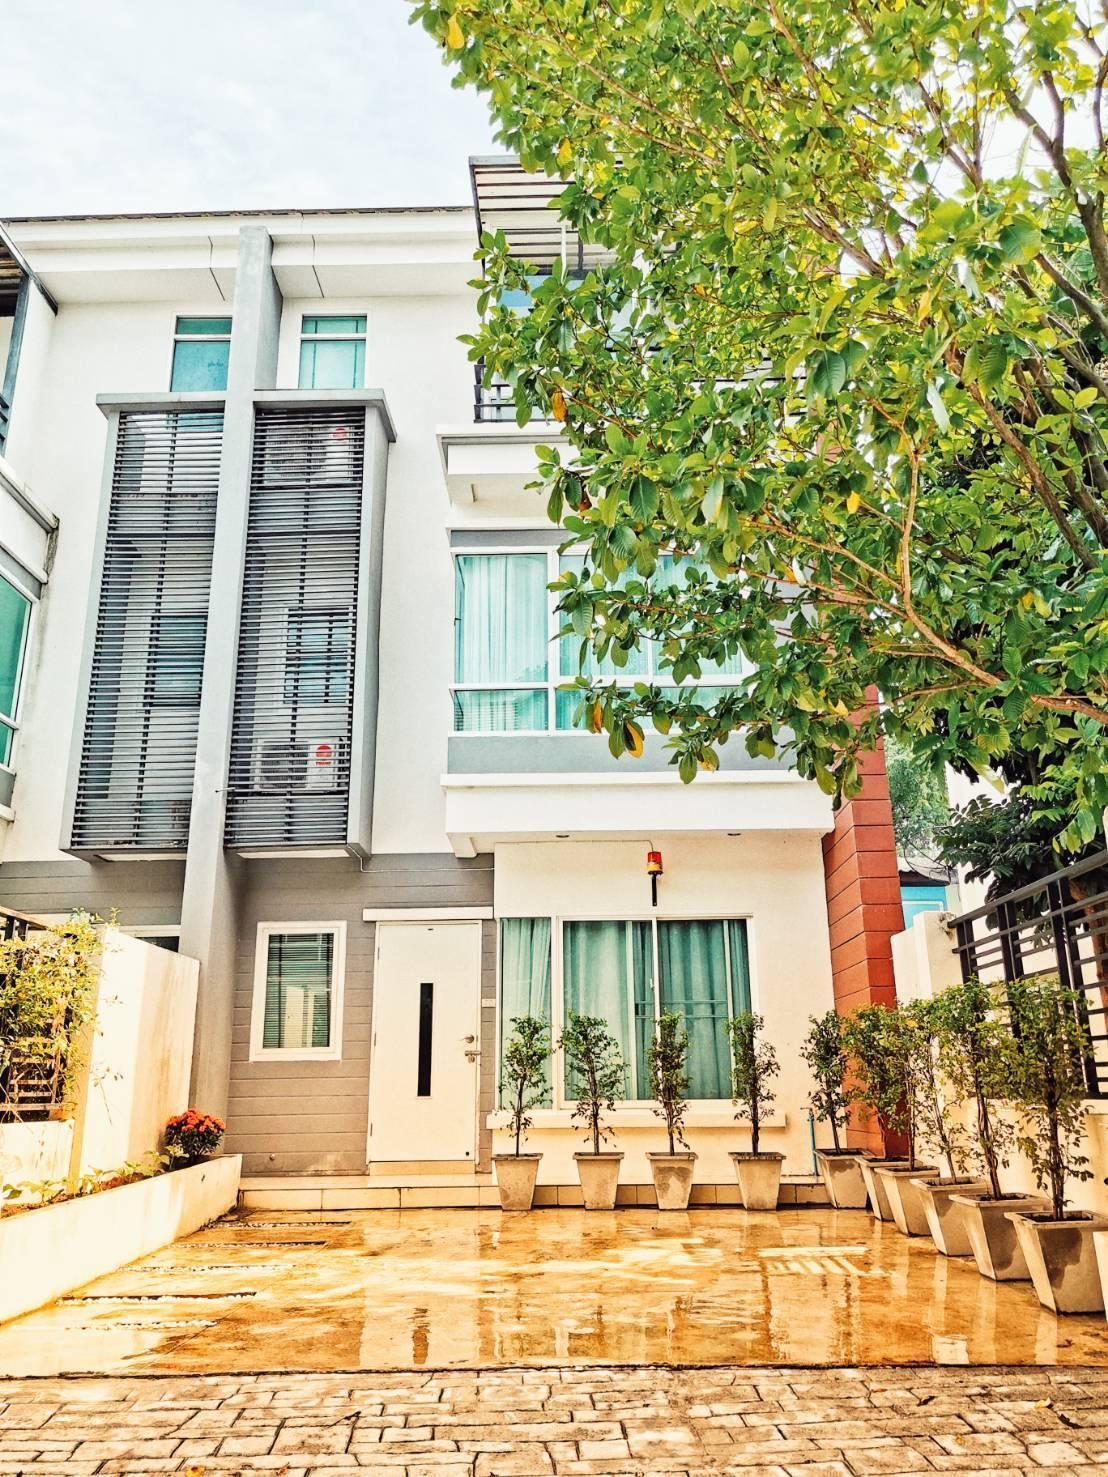 MaKuea Guest House and Apartment Service อพาร์ตเมนต์ 3 ห้องนอน 3 ห้องน้ำส่วนตัว ขนาด 44 ตร.ม. – ตัวเมืองพิษณุโลก